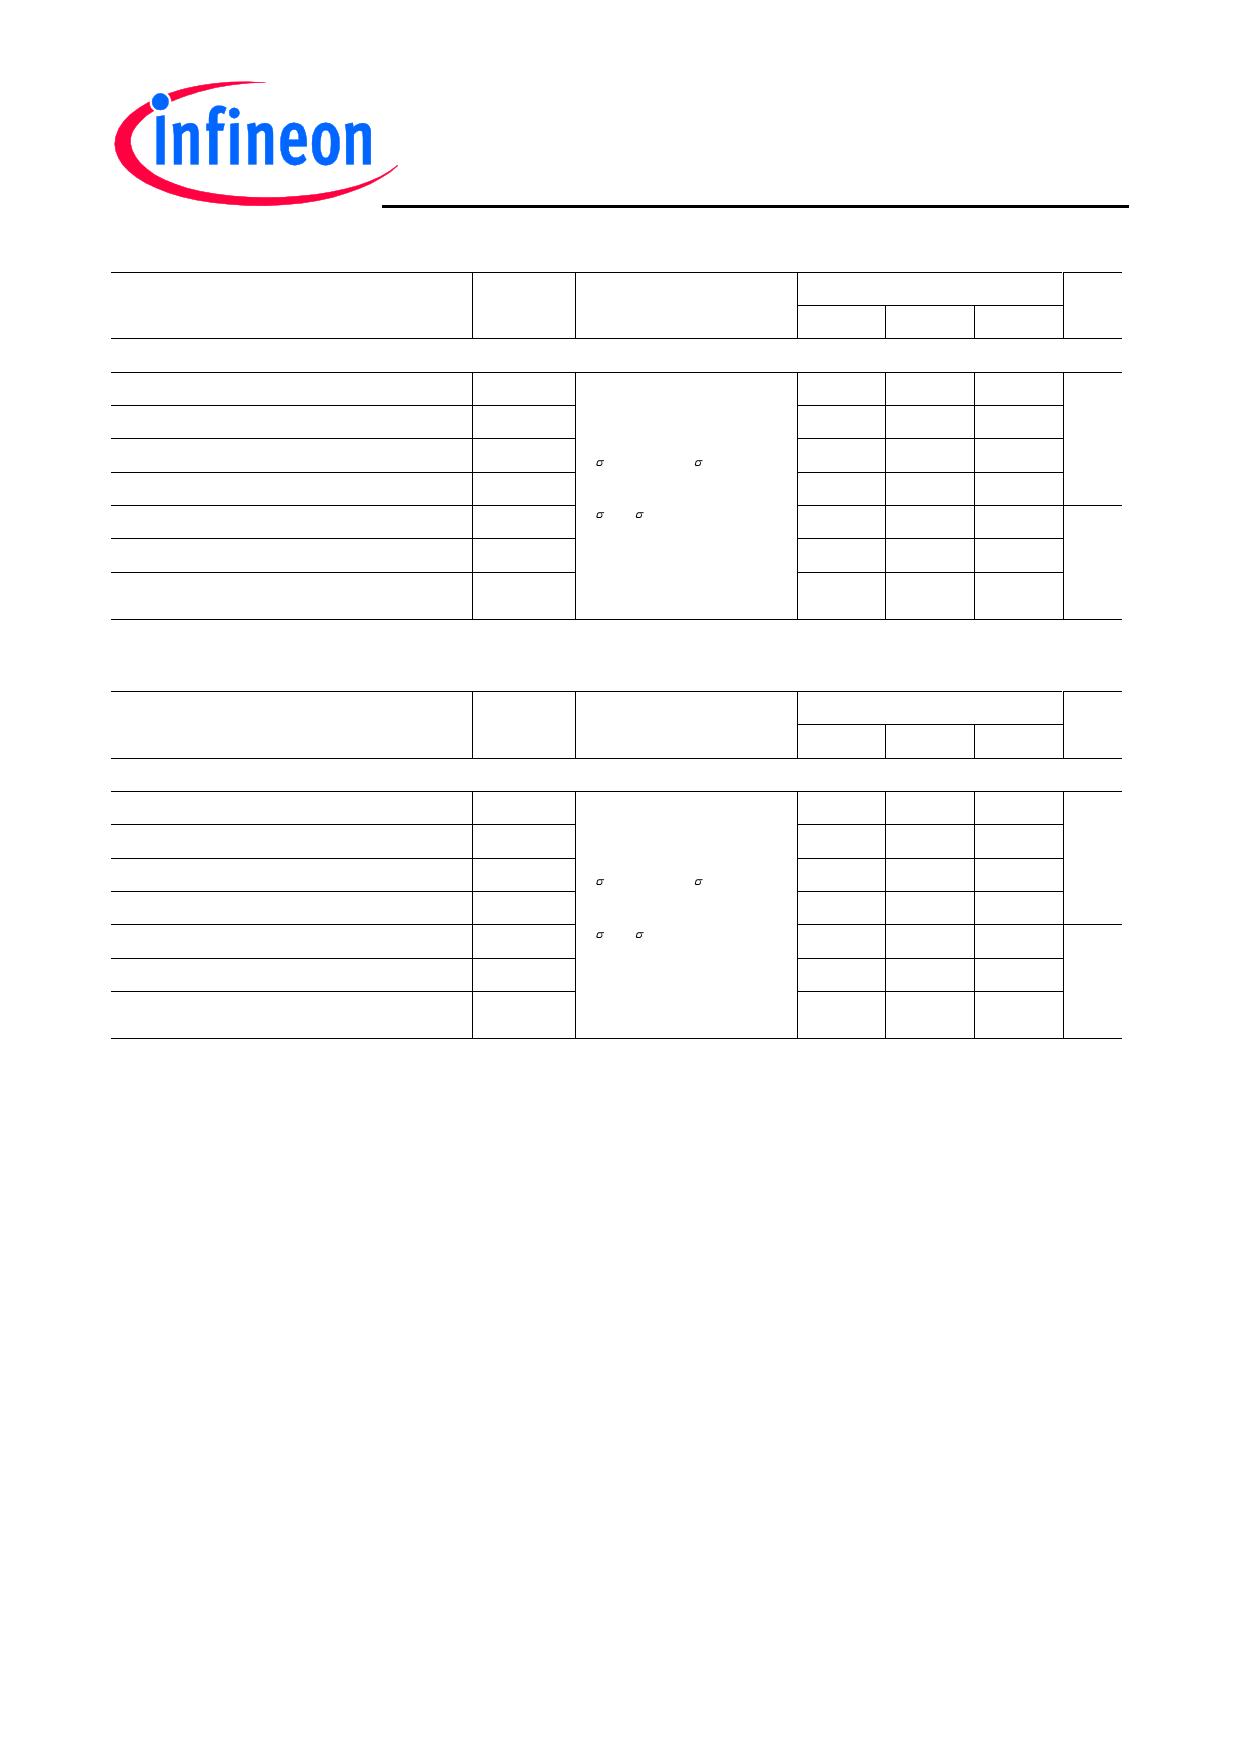 IGD06N60T pdf, ピン配列